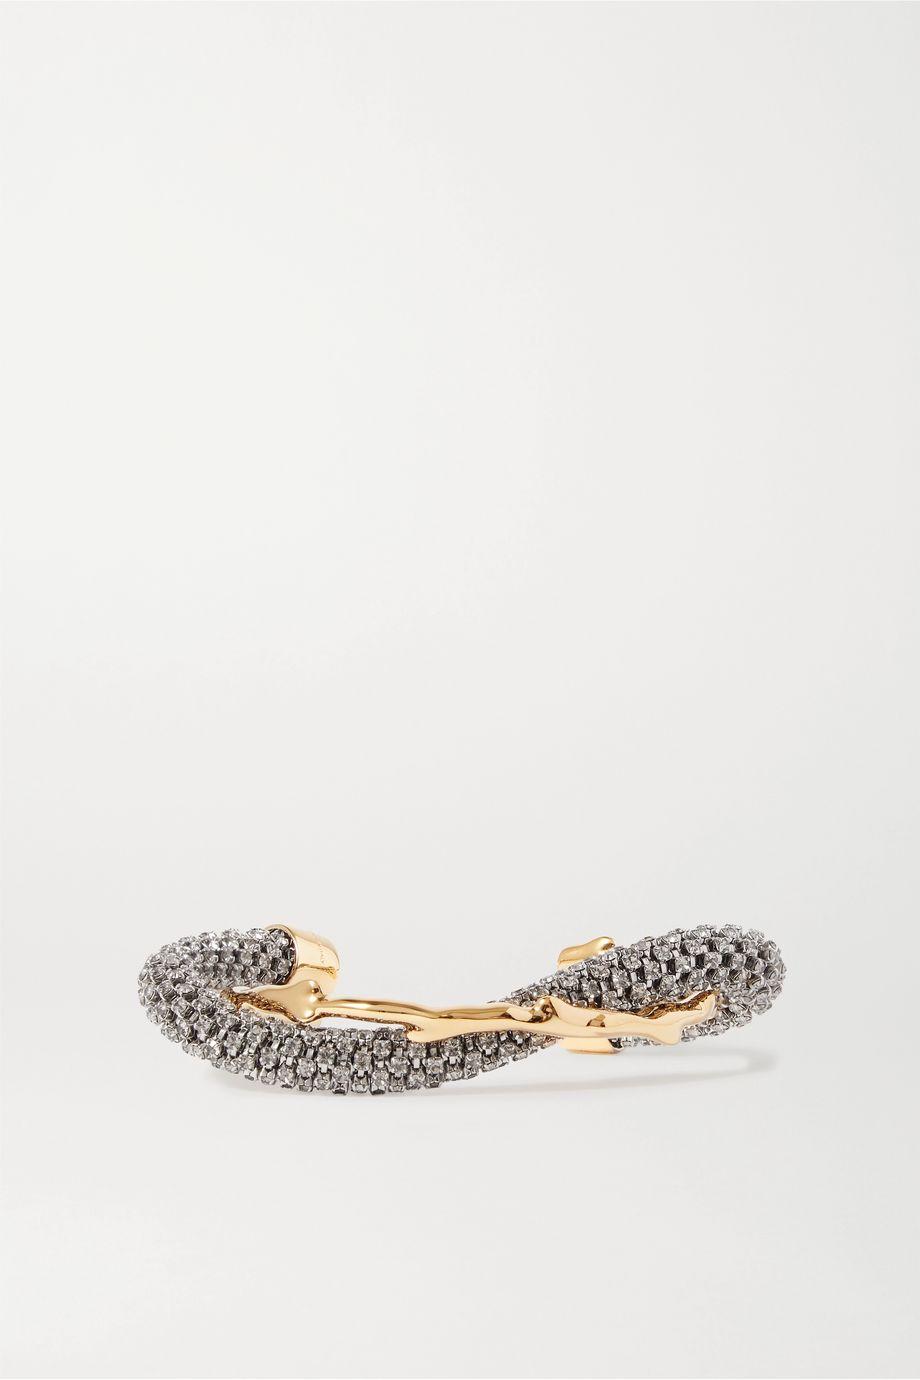 Chloé Daria Swarovski crystal-embellished gold-tone bracelet